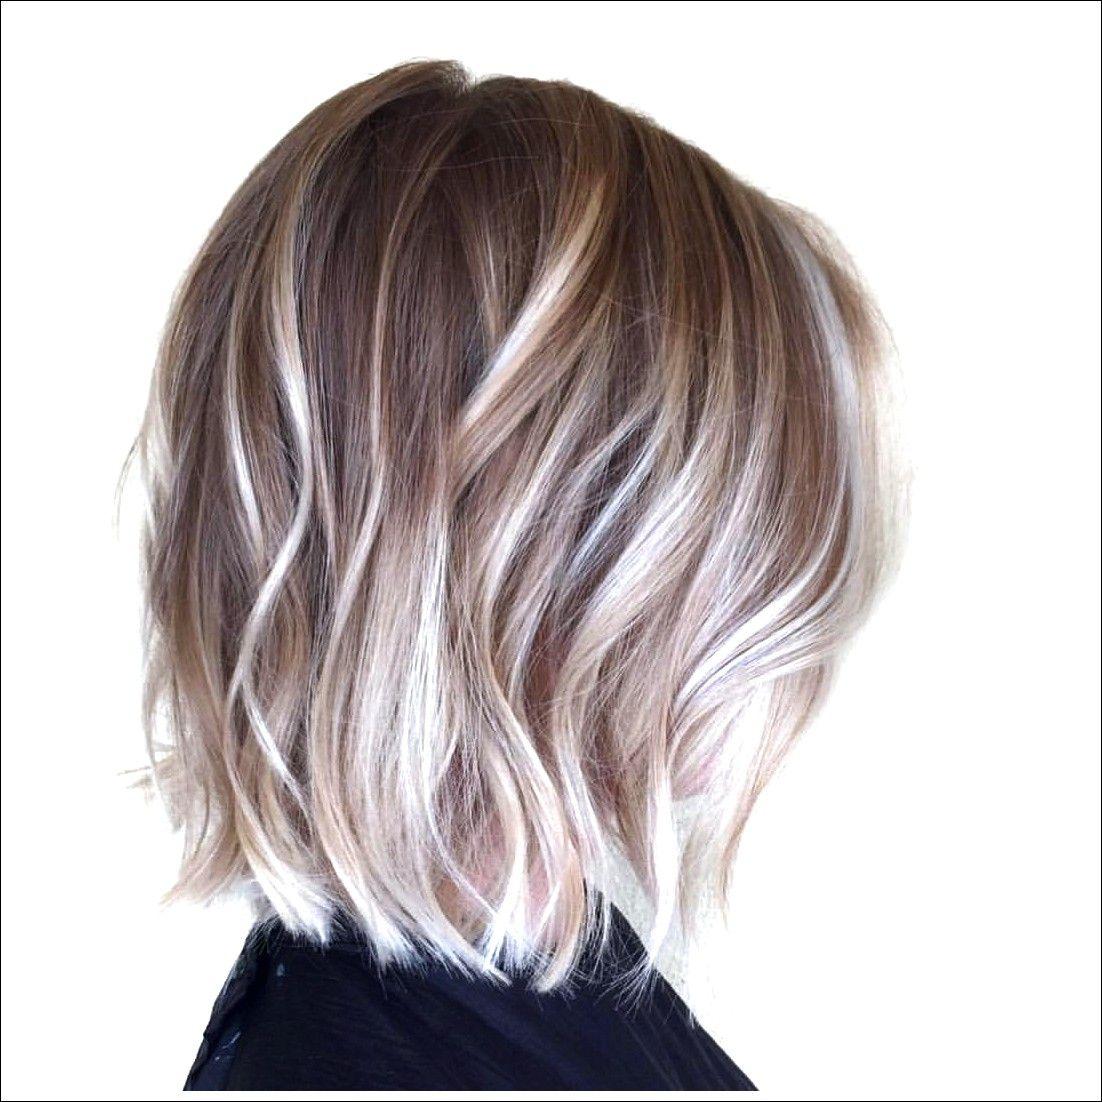 30 Best Balayage Frisuren Fur Kurzes Haar 2018 Balayage Hair Color Ideas Beste Frisuren Balayage Frisur Aschblond Haarfarbe Haarfarben